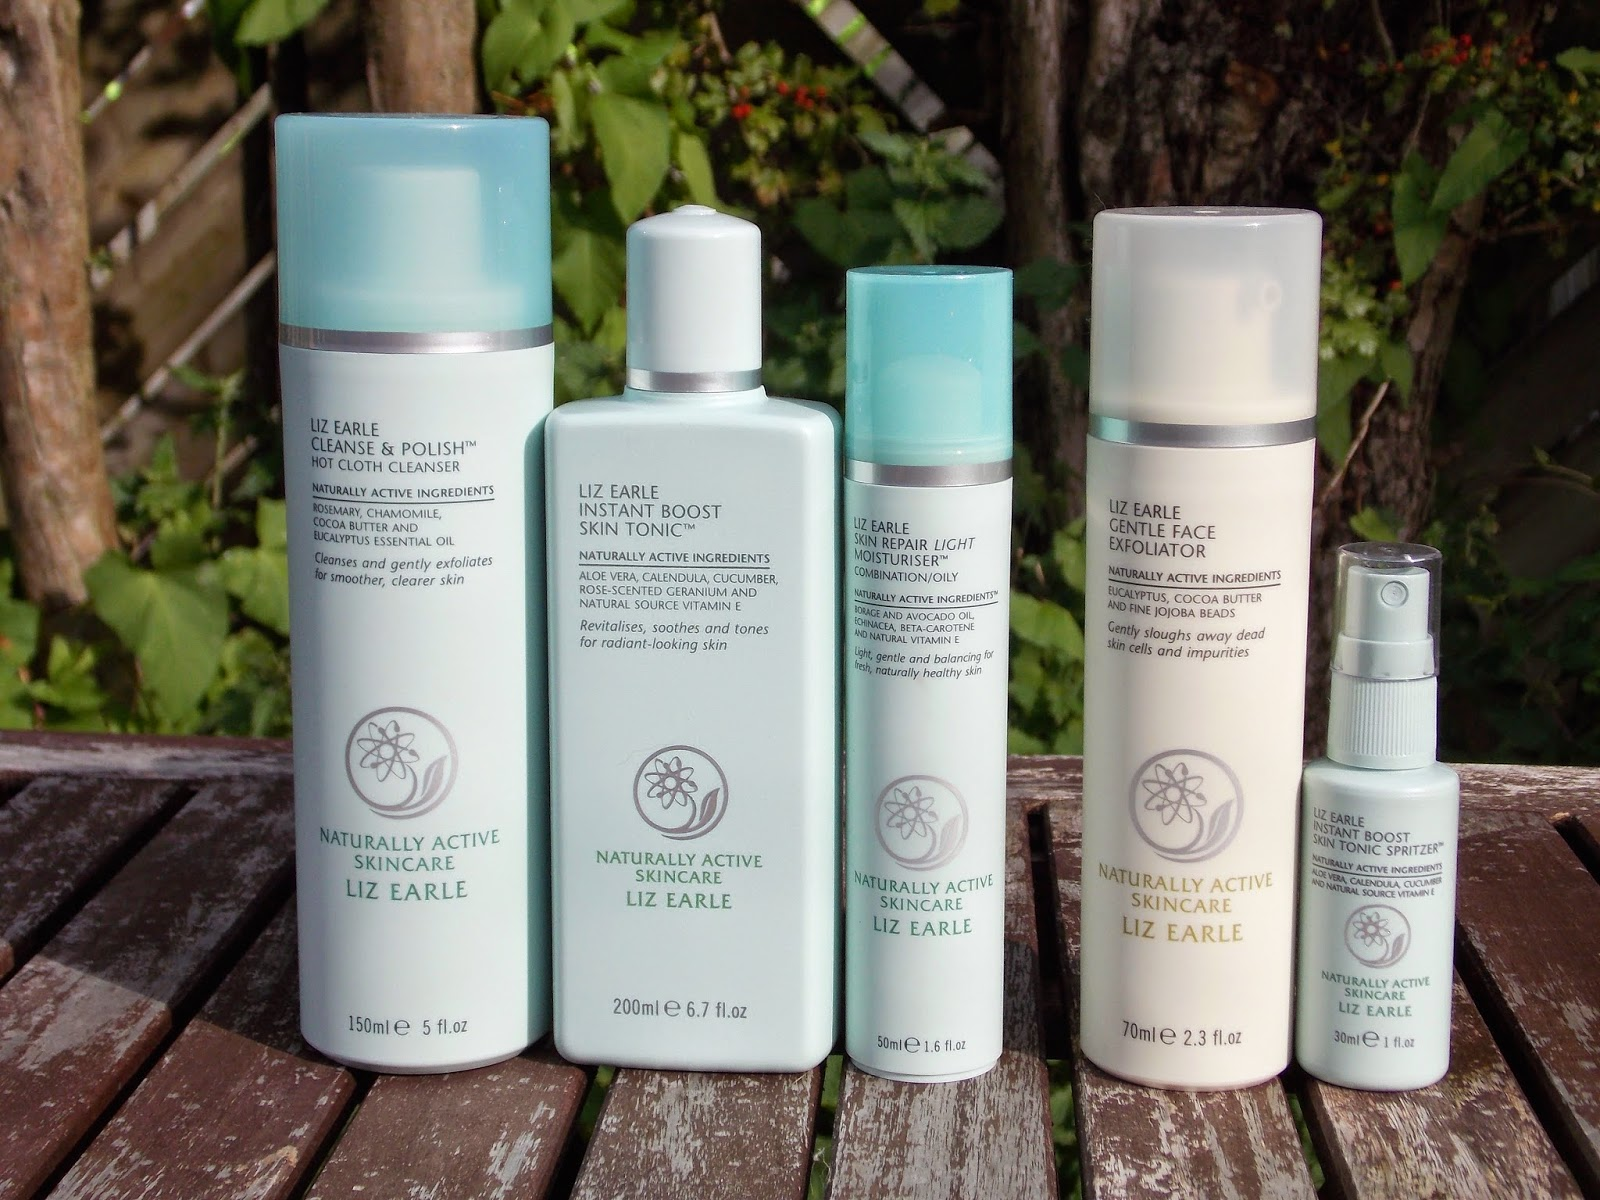 Liz Earle Cleanse and Polish Hot Cloth Cleanser, Liz Earle Instant Boost Skin Tonic, Liz Earle Skin Repair Moisturiser, Liz Earle Gentle Face Exfoliator